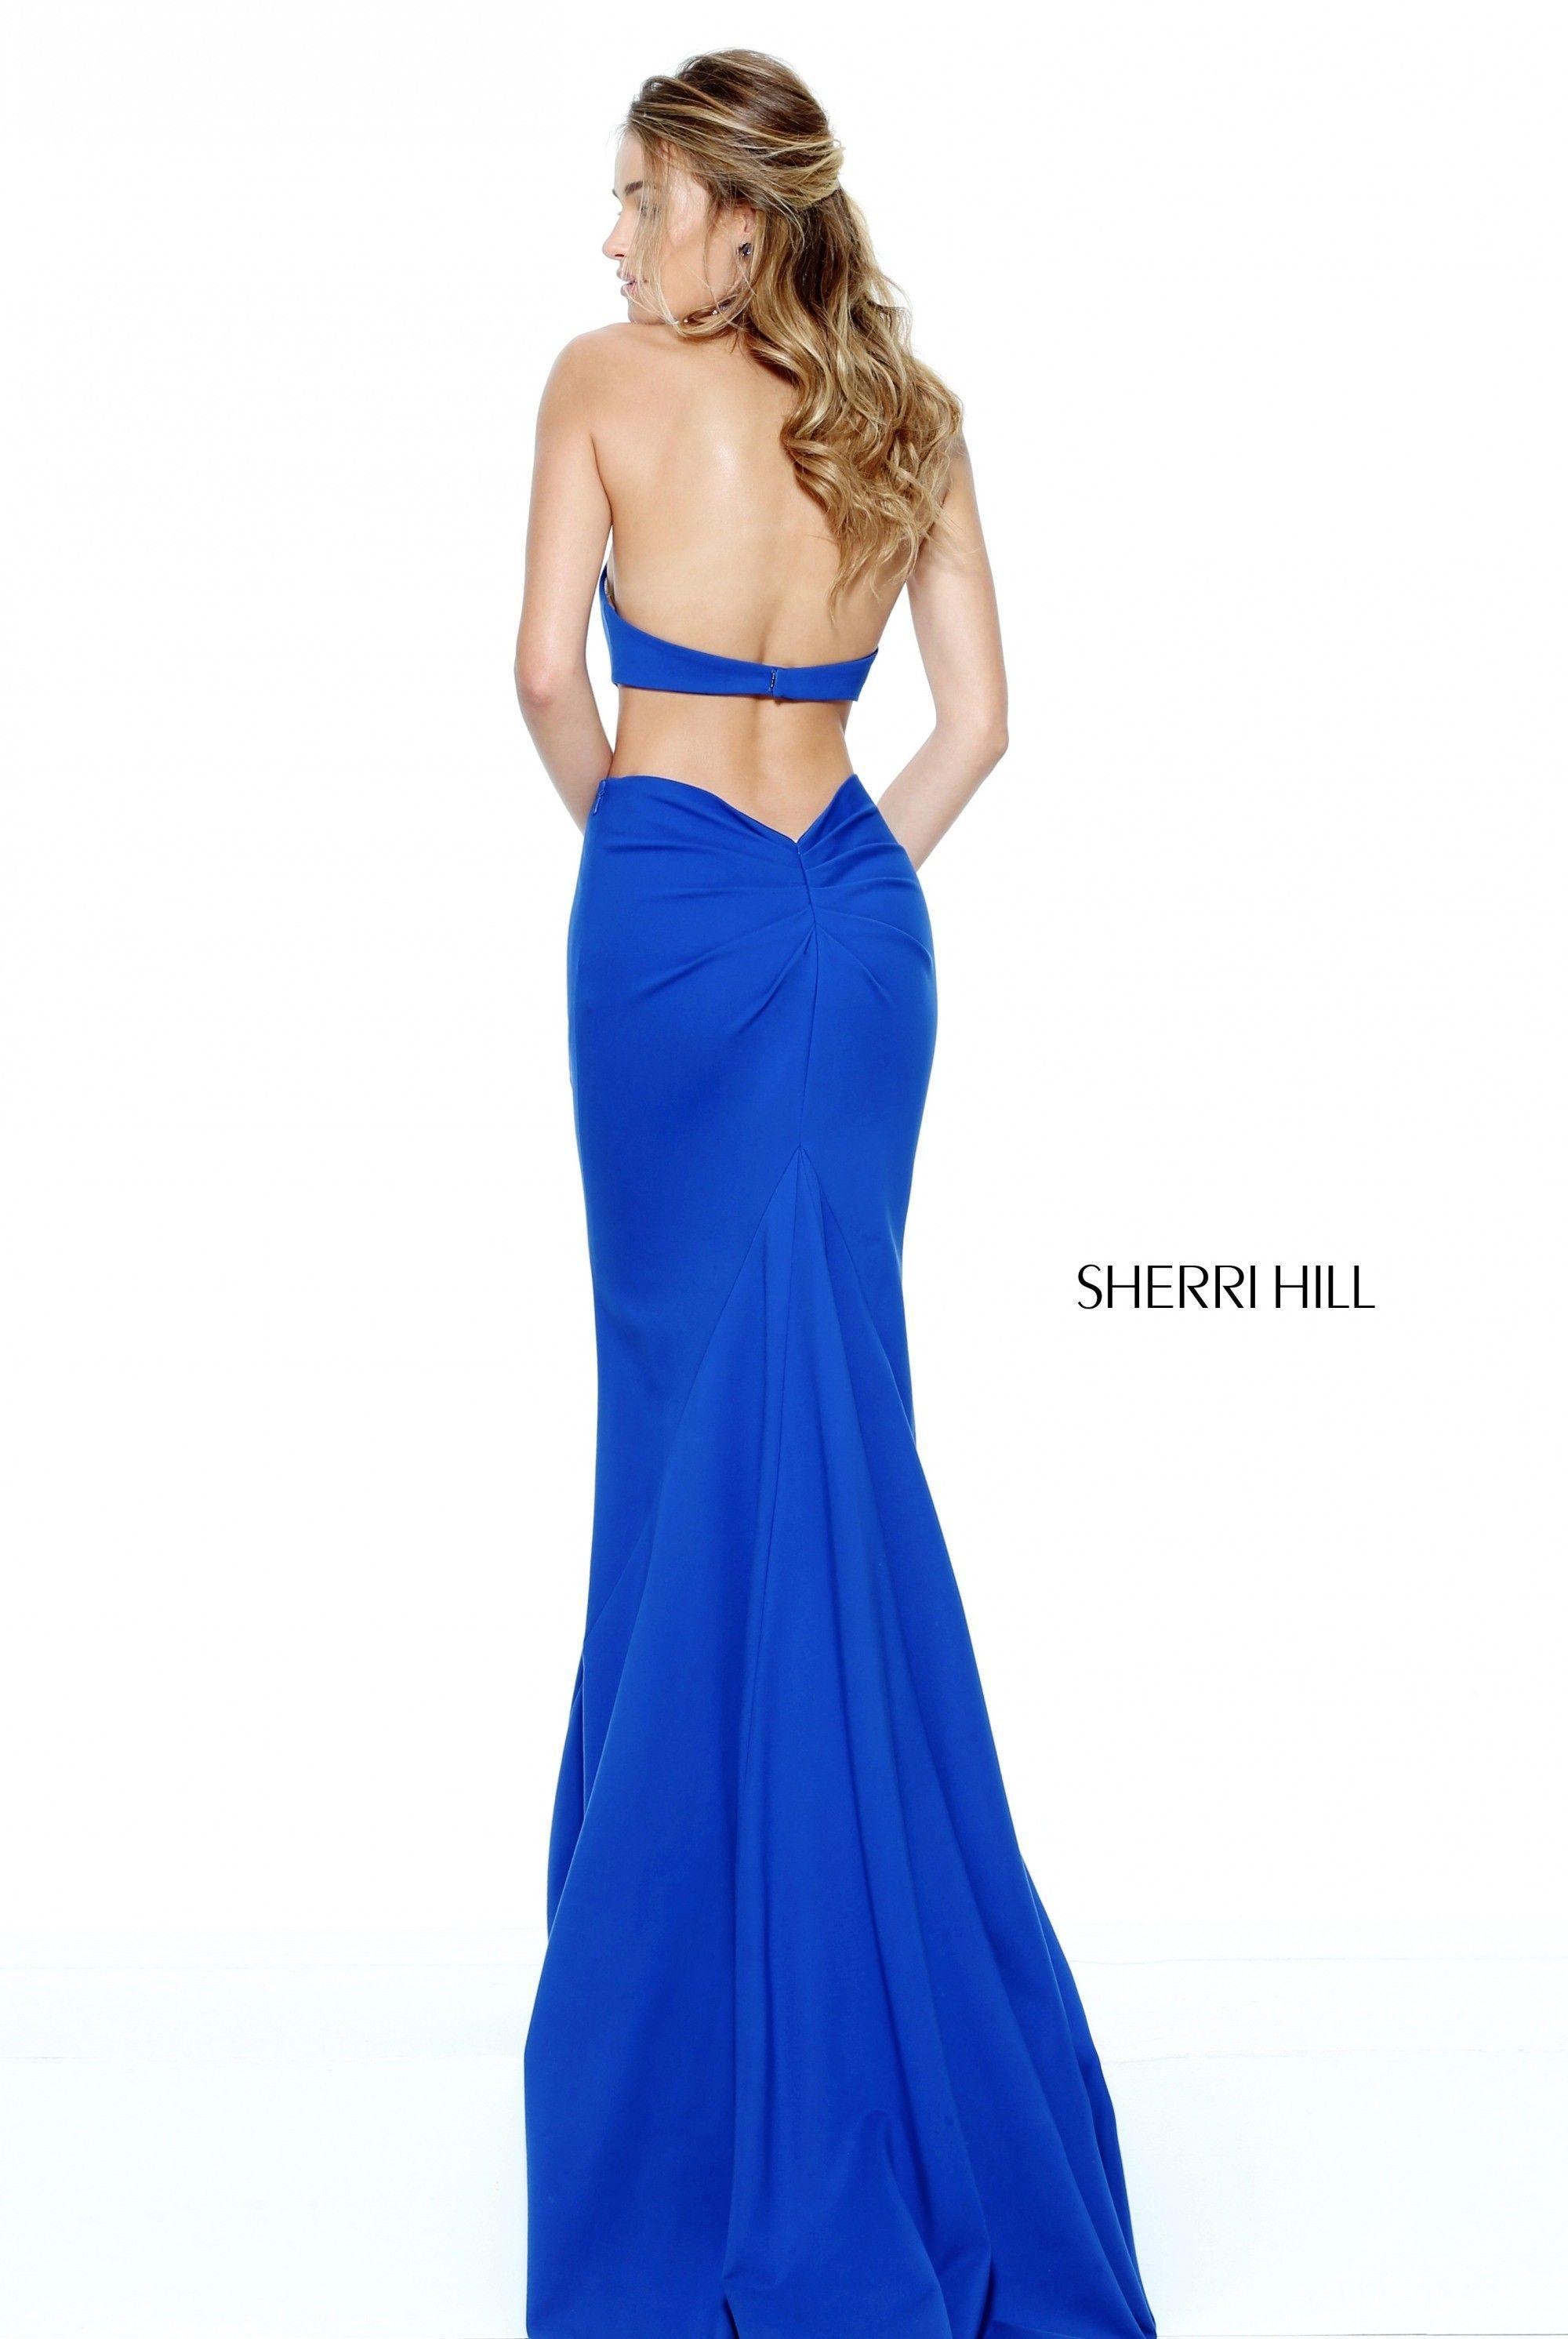 Sherri hill prom dress sherrihill promdress prom sherri